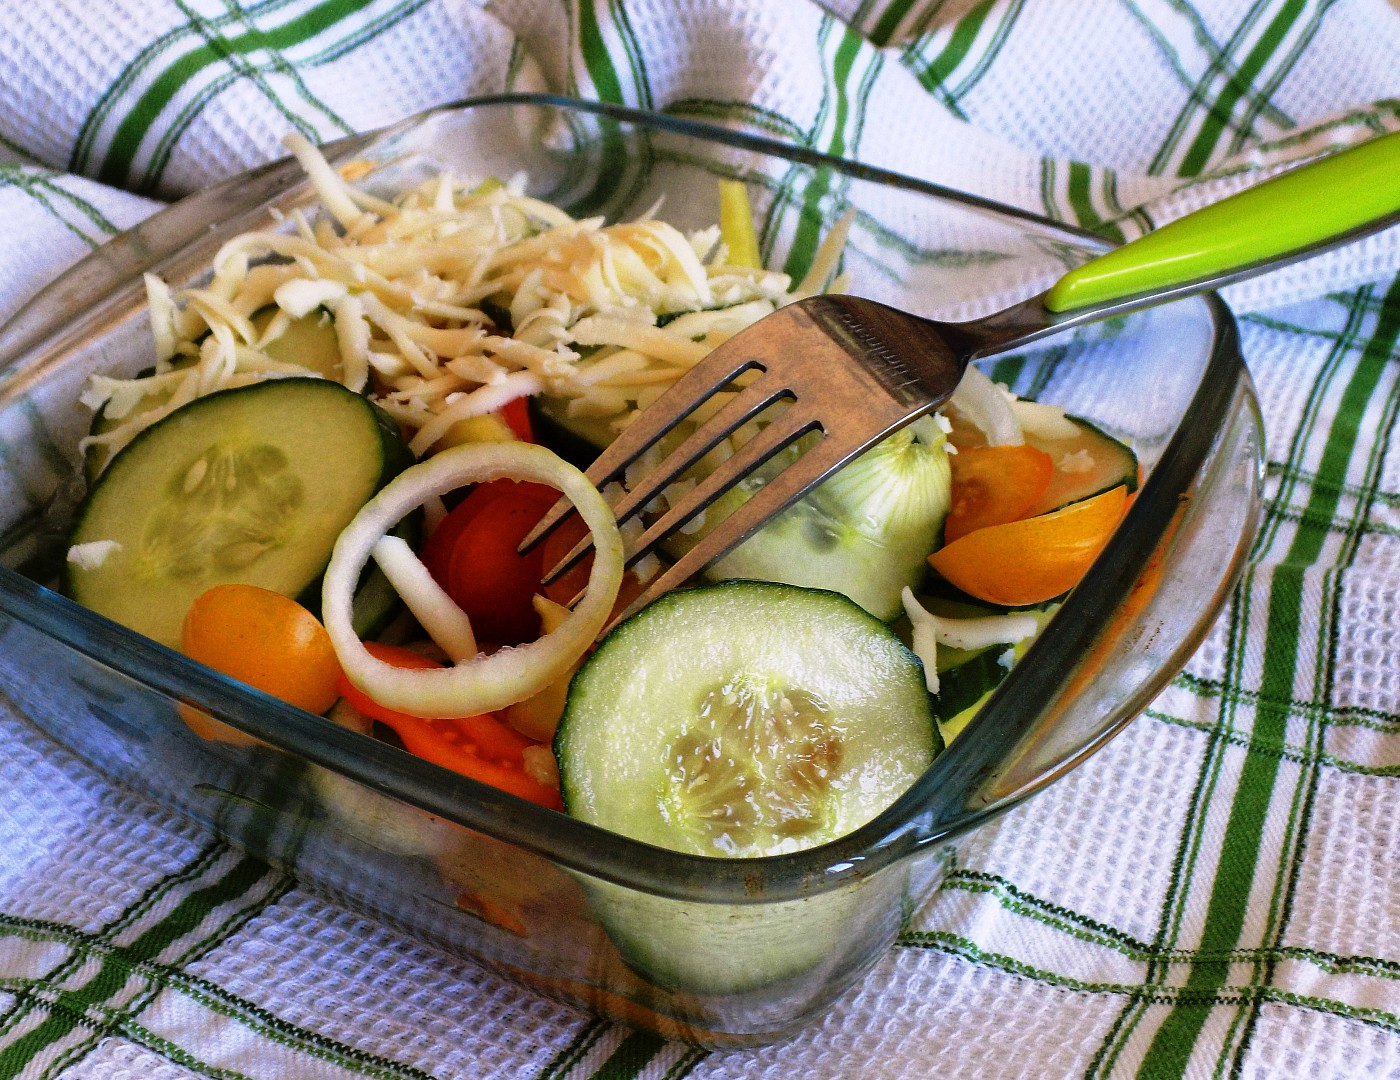 Okurkový salát se sýrem recept